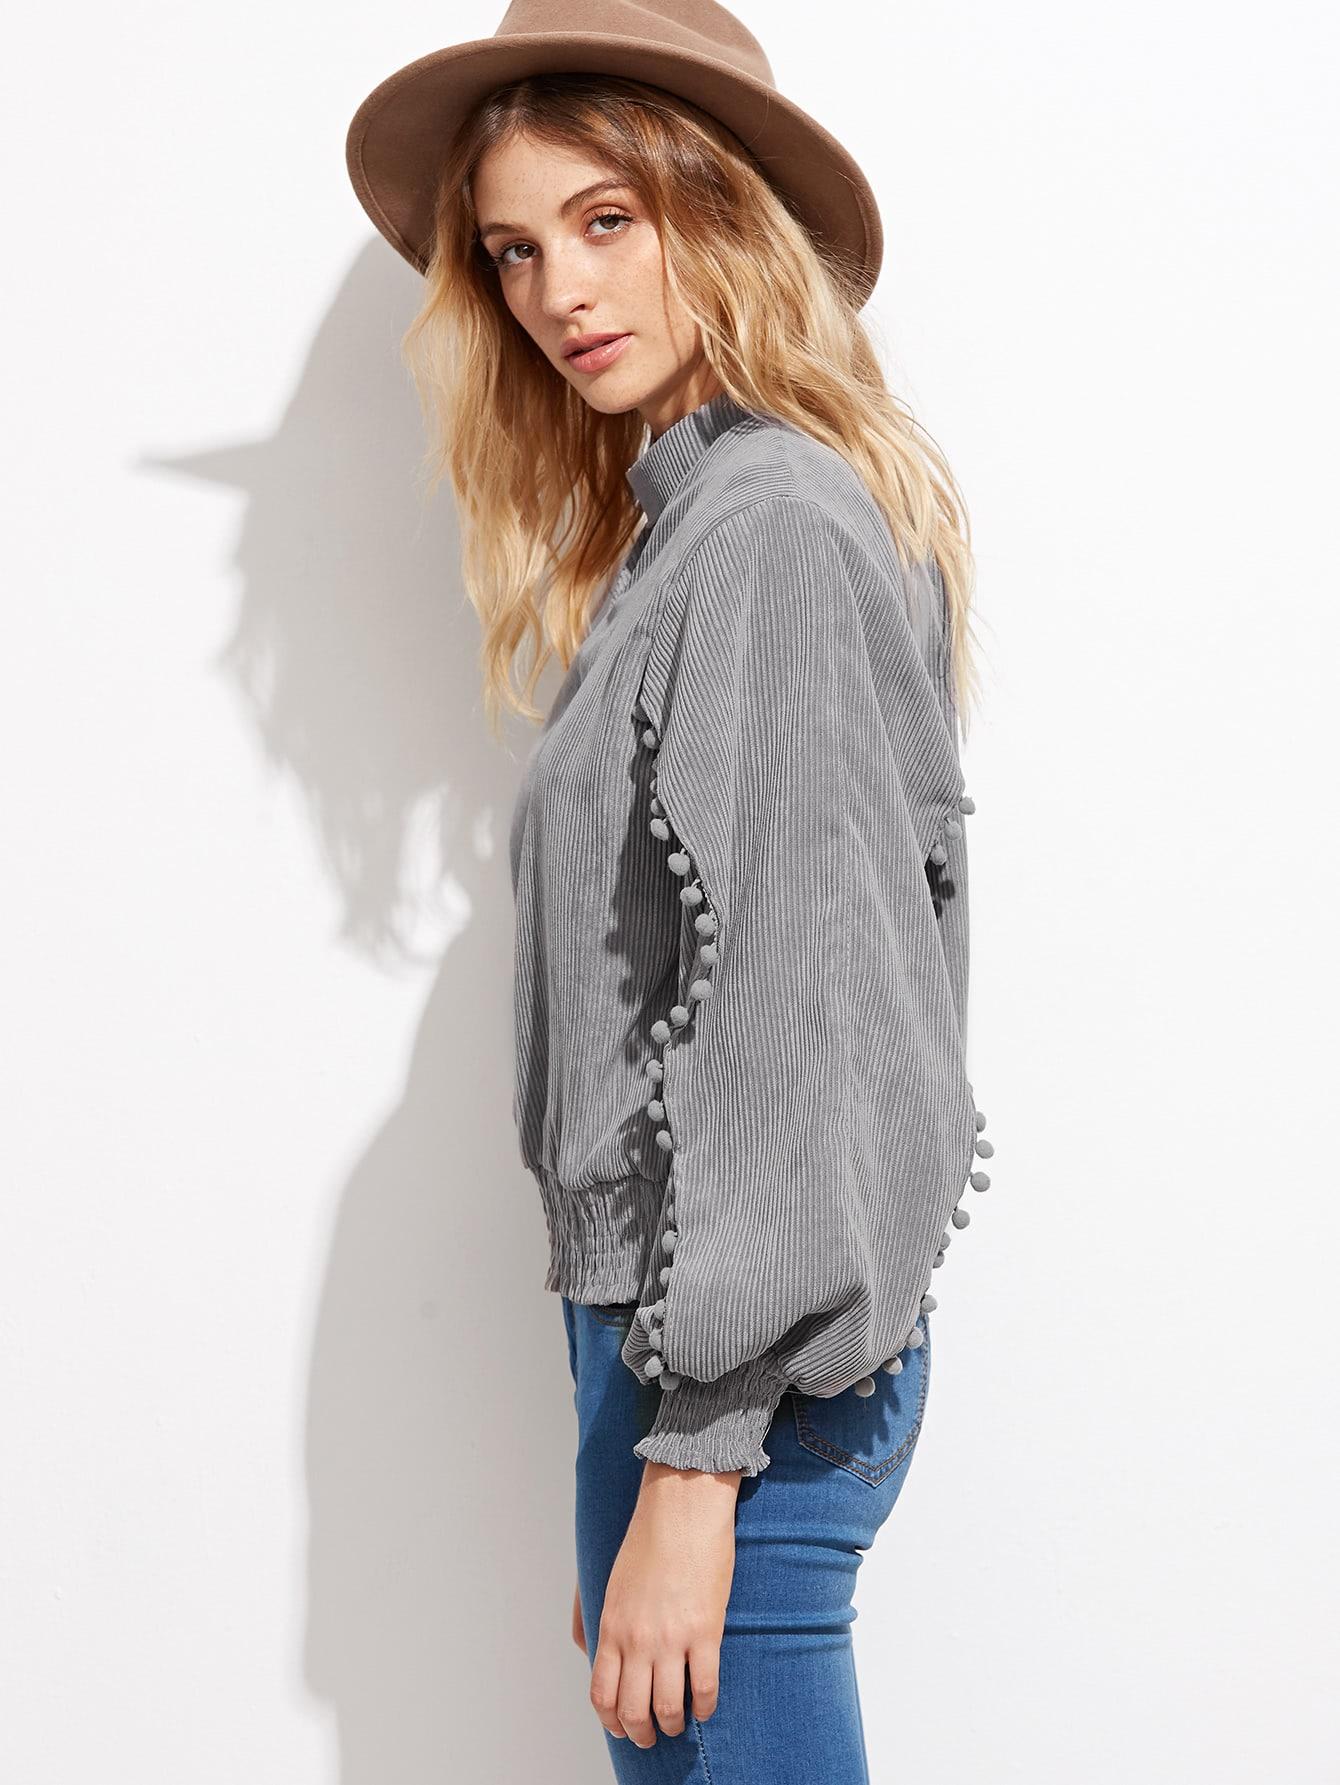 blouse160909021_2